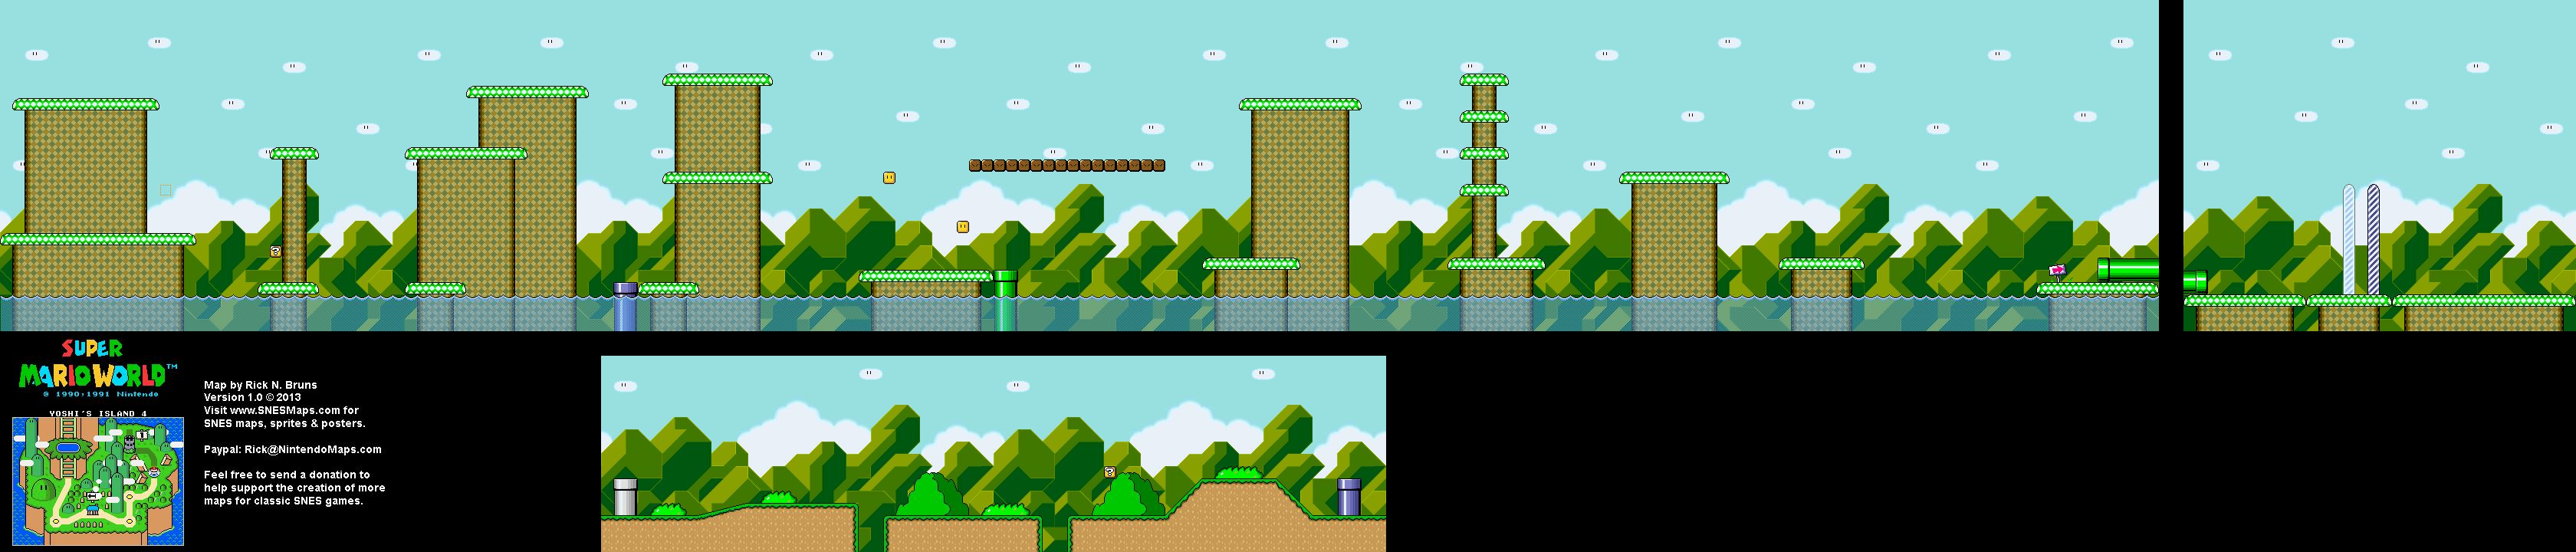 Super Mario World - Yoshi\'s Island 4 Super Nintendo SNES Map BG